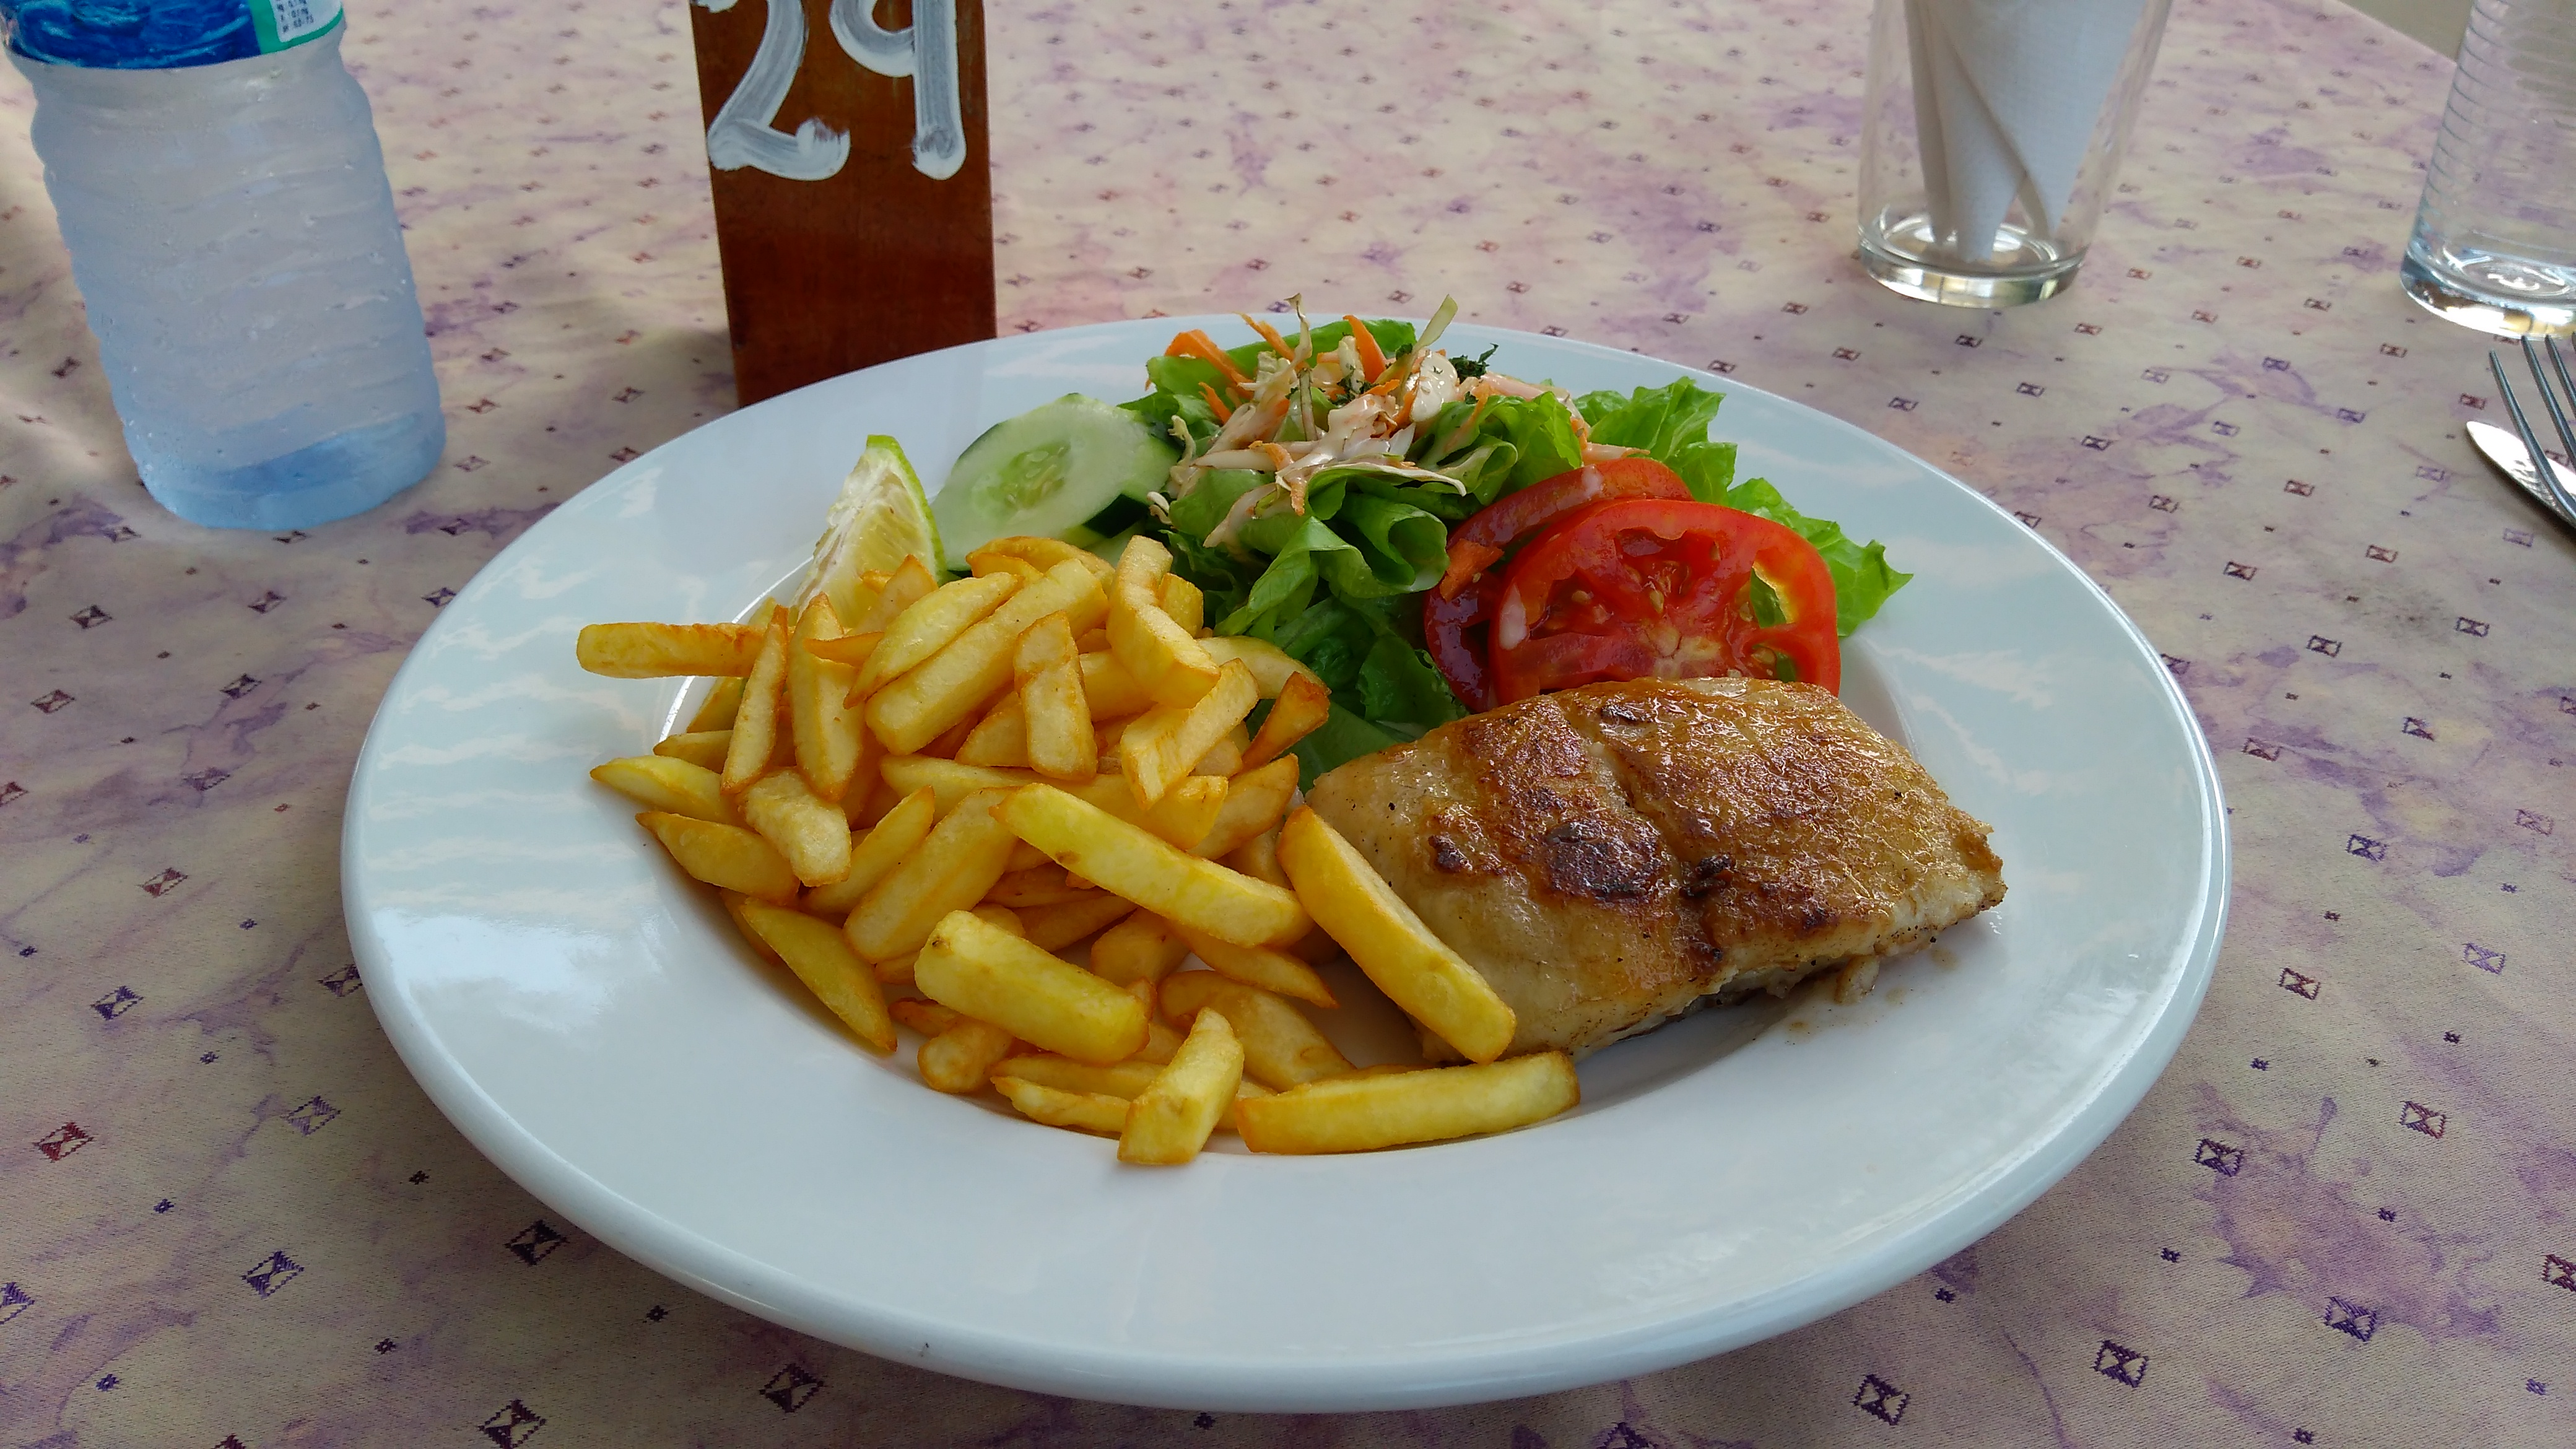 https://foodloader.net/blub_2018-07-23_Red_Snapper_Filet_mit_Salat_und_Pommes.jpg